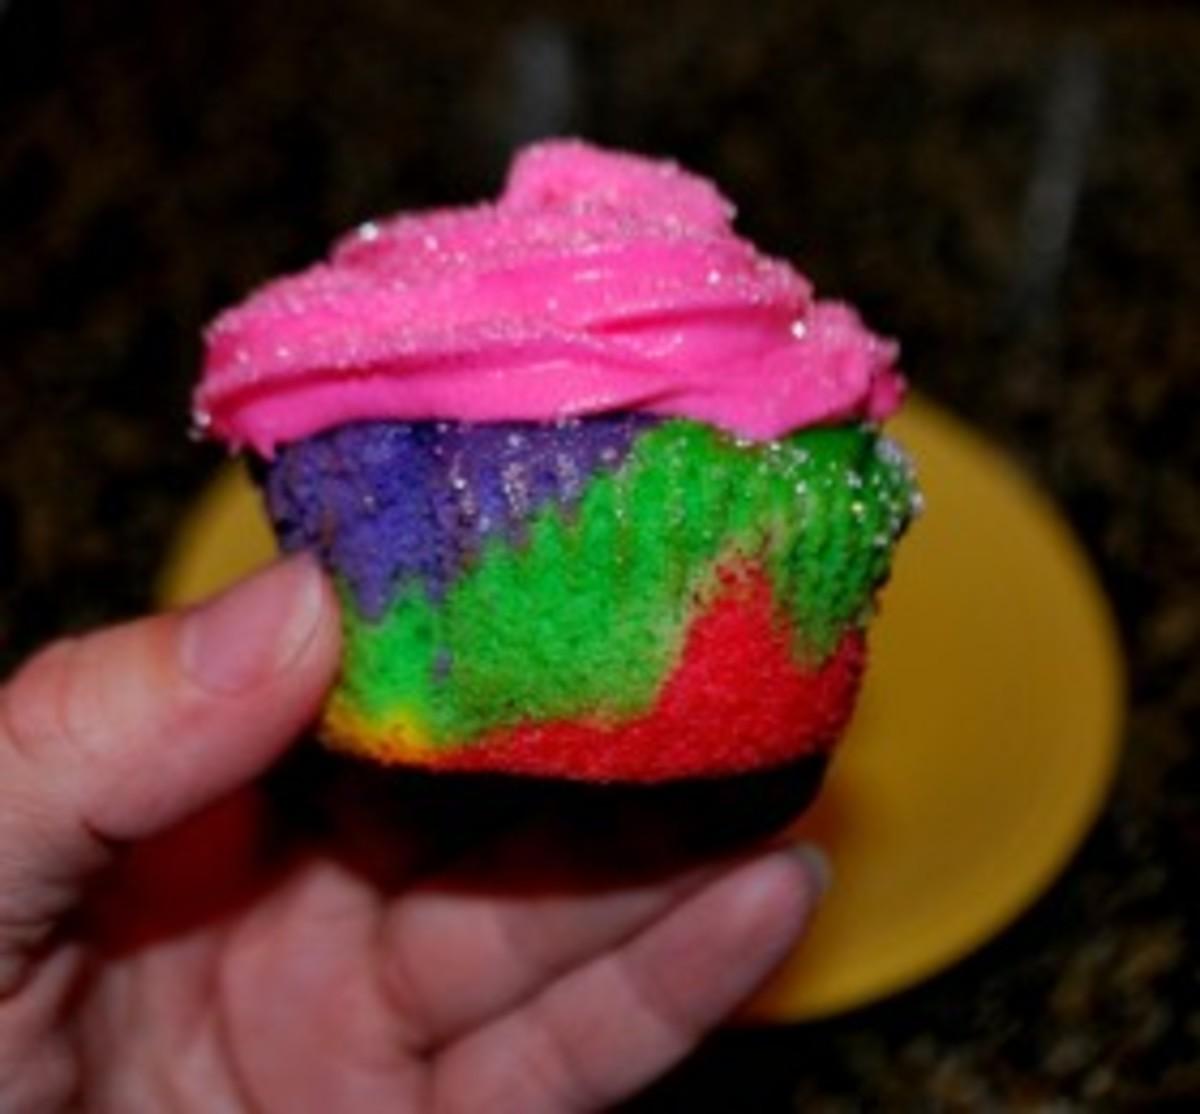 angry-julie-rainbow-cupcakes-280x260